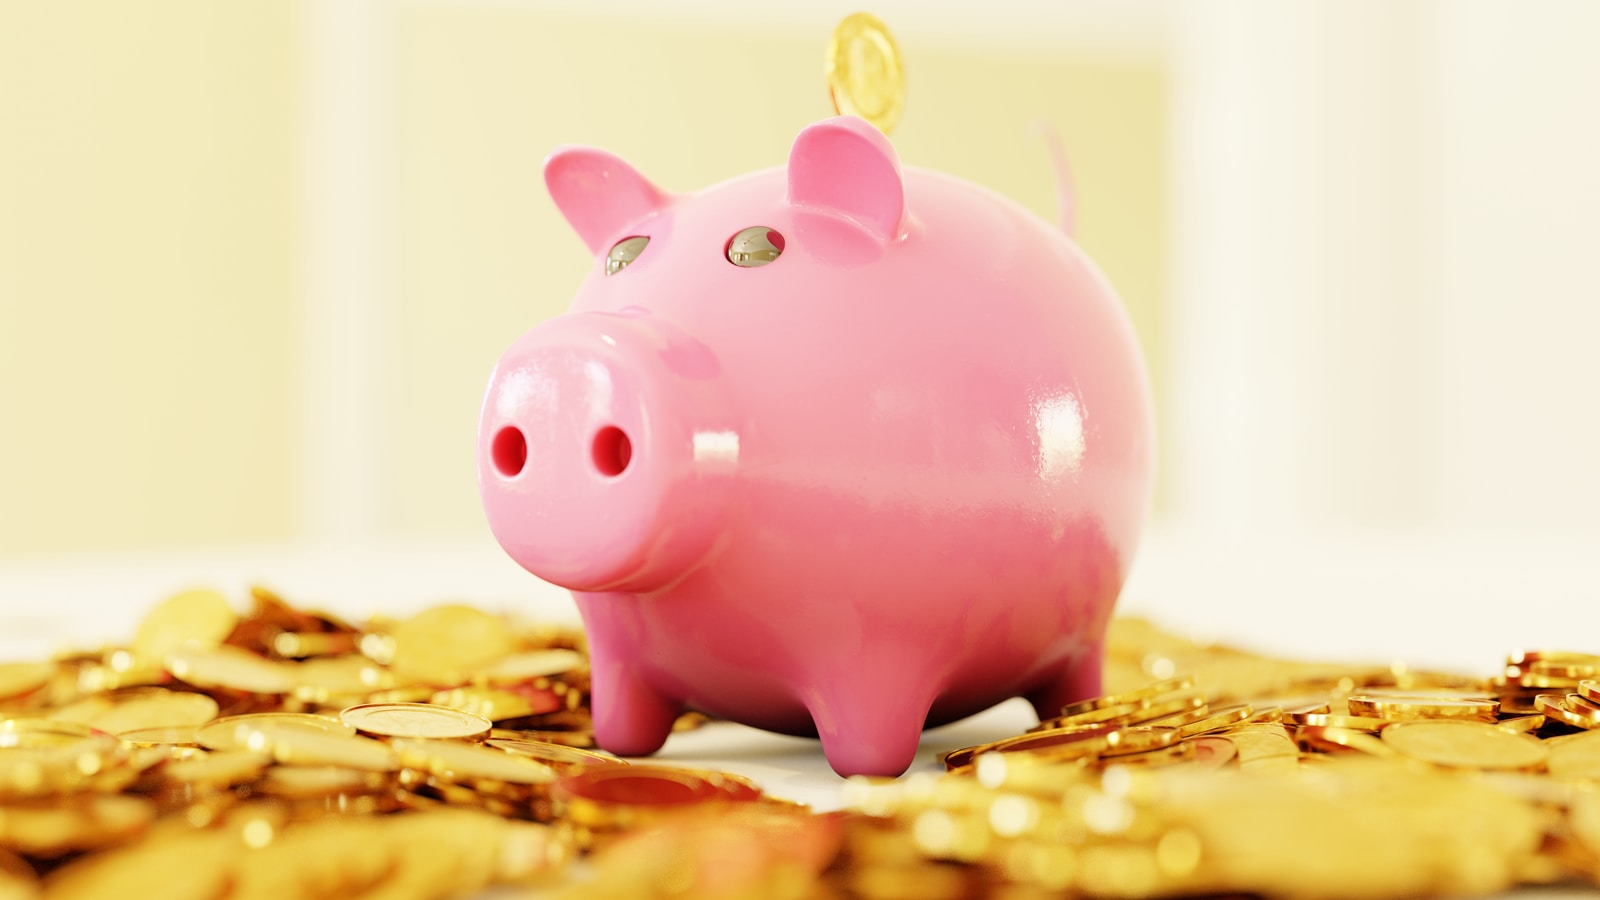 4 Ways to Stop Your Overspending